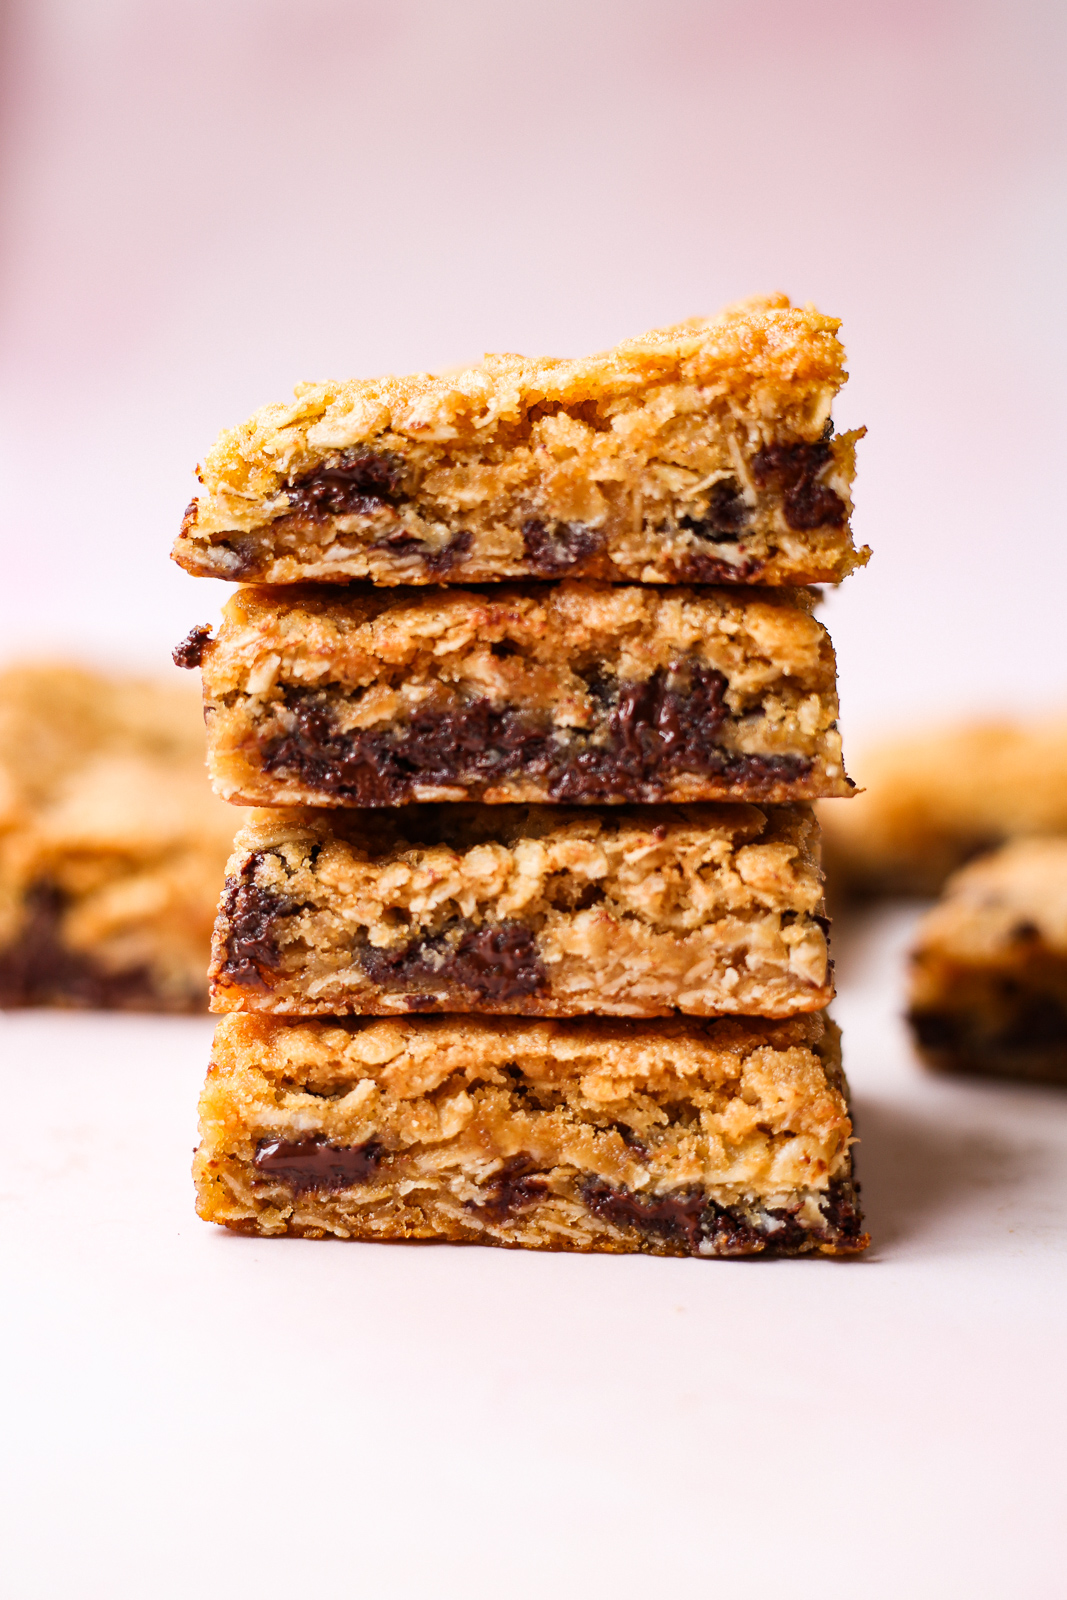 GoGo's Oatmeal Chocolate Chip Bars